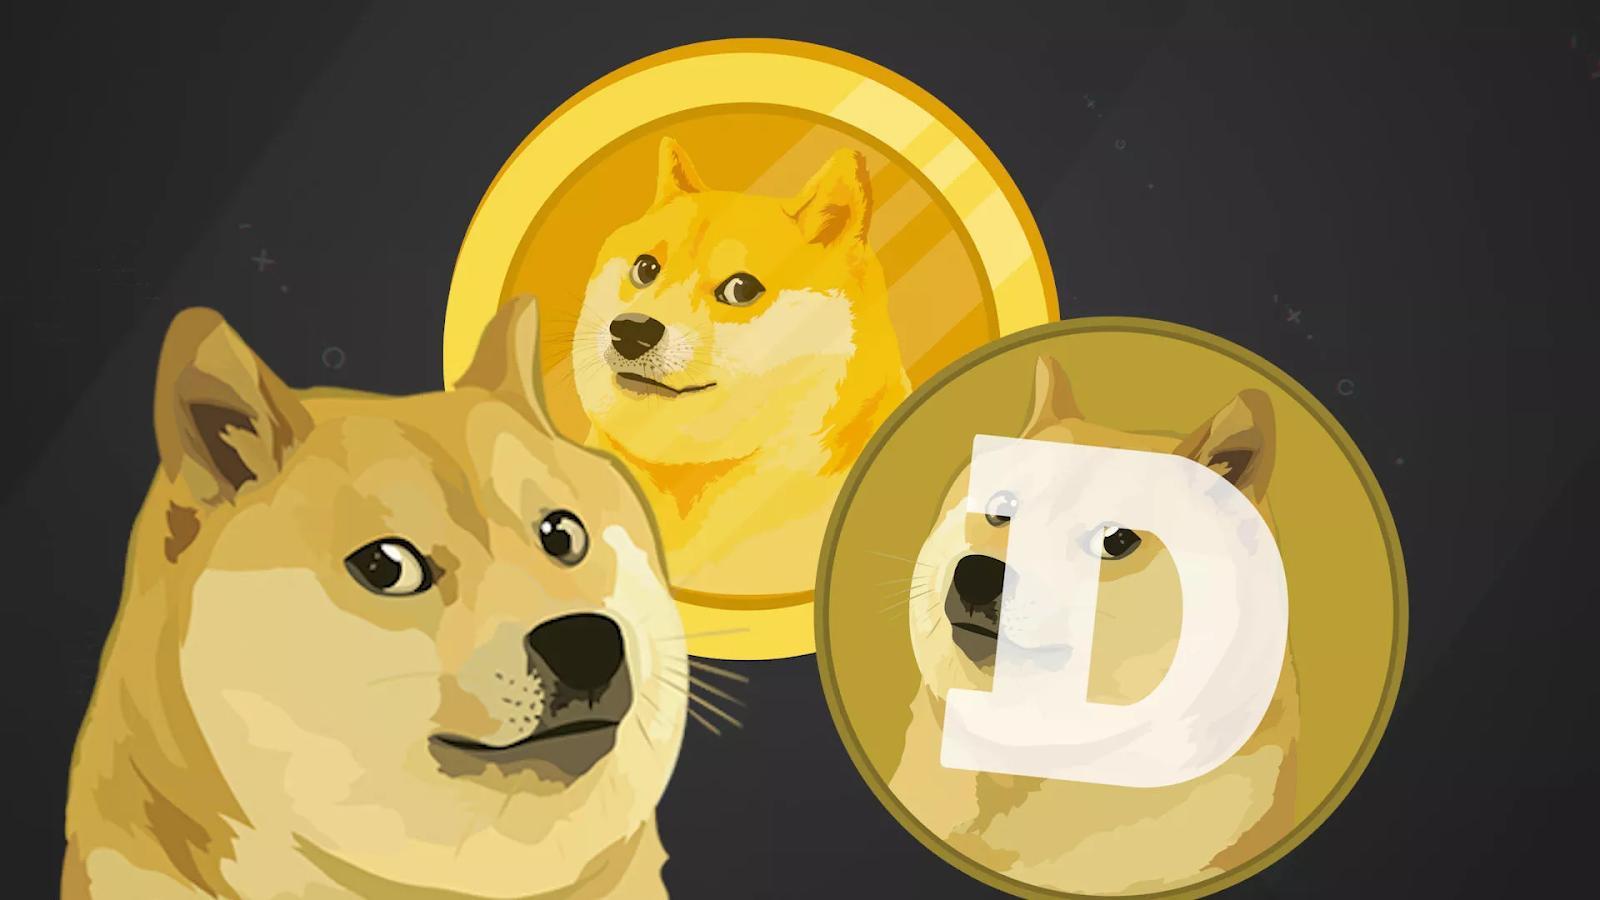 buy dogecoin iq variantas protingiausia prekyba